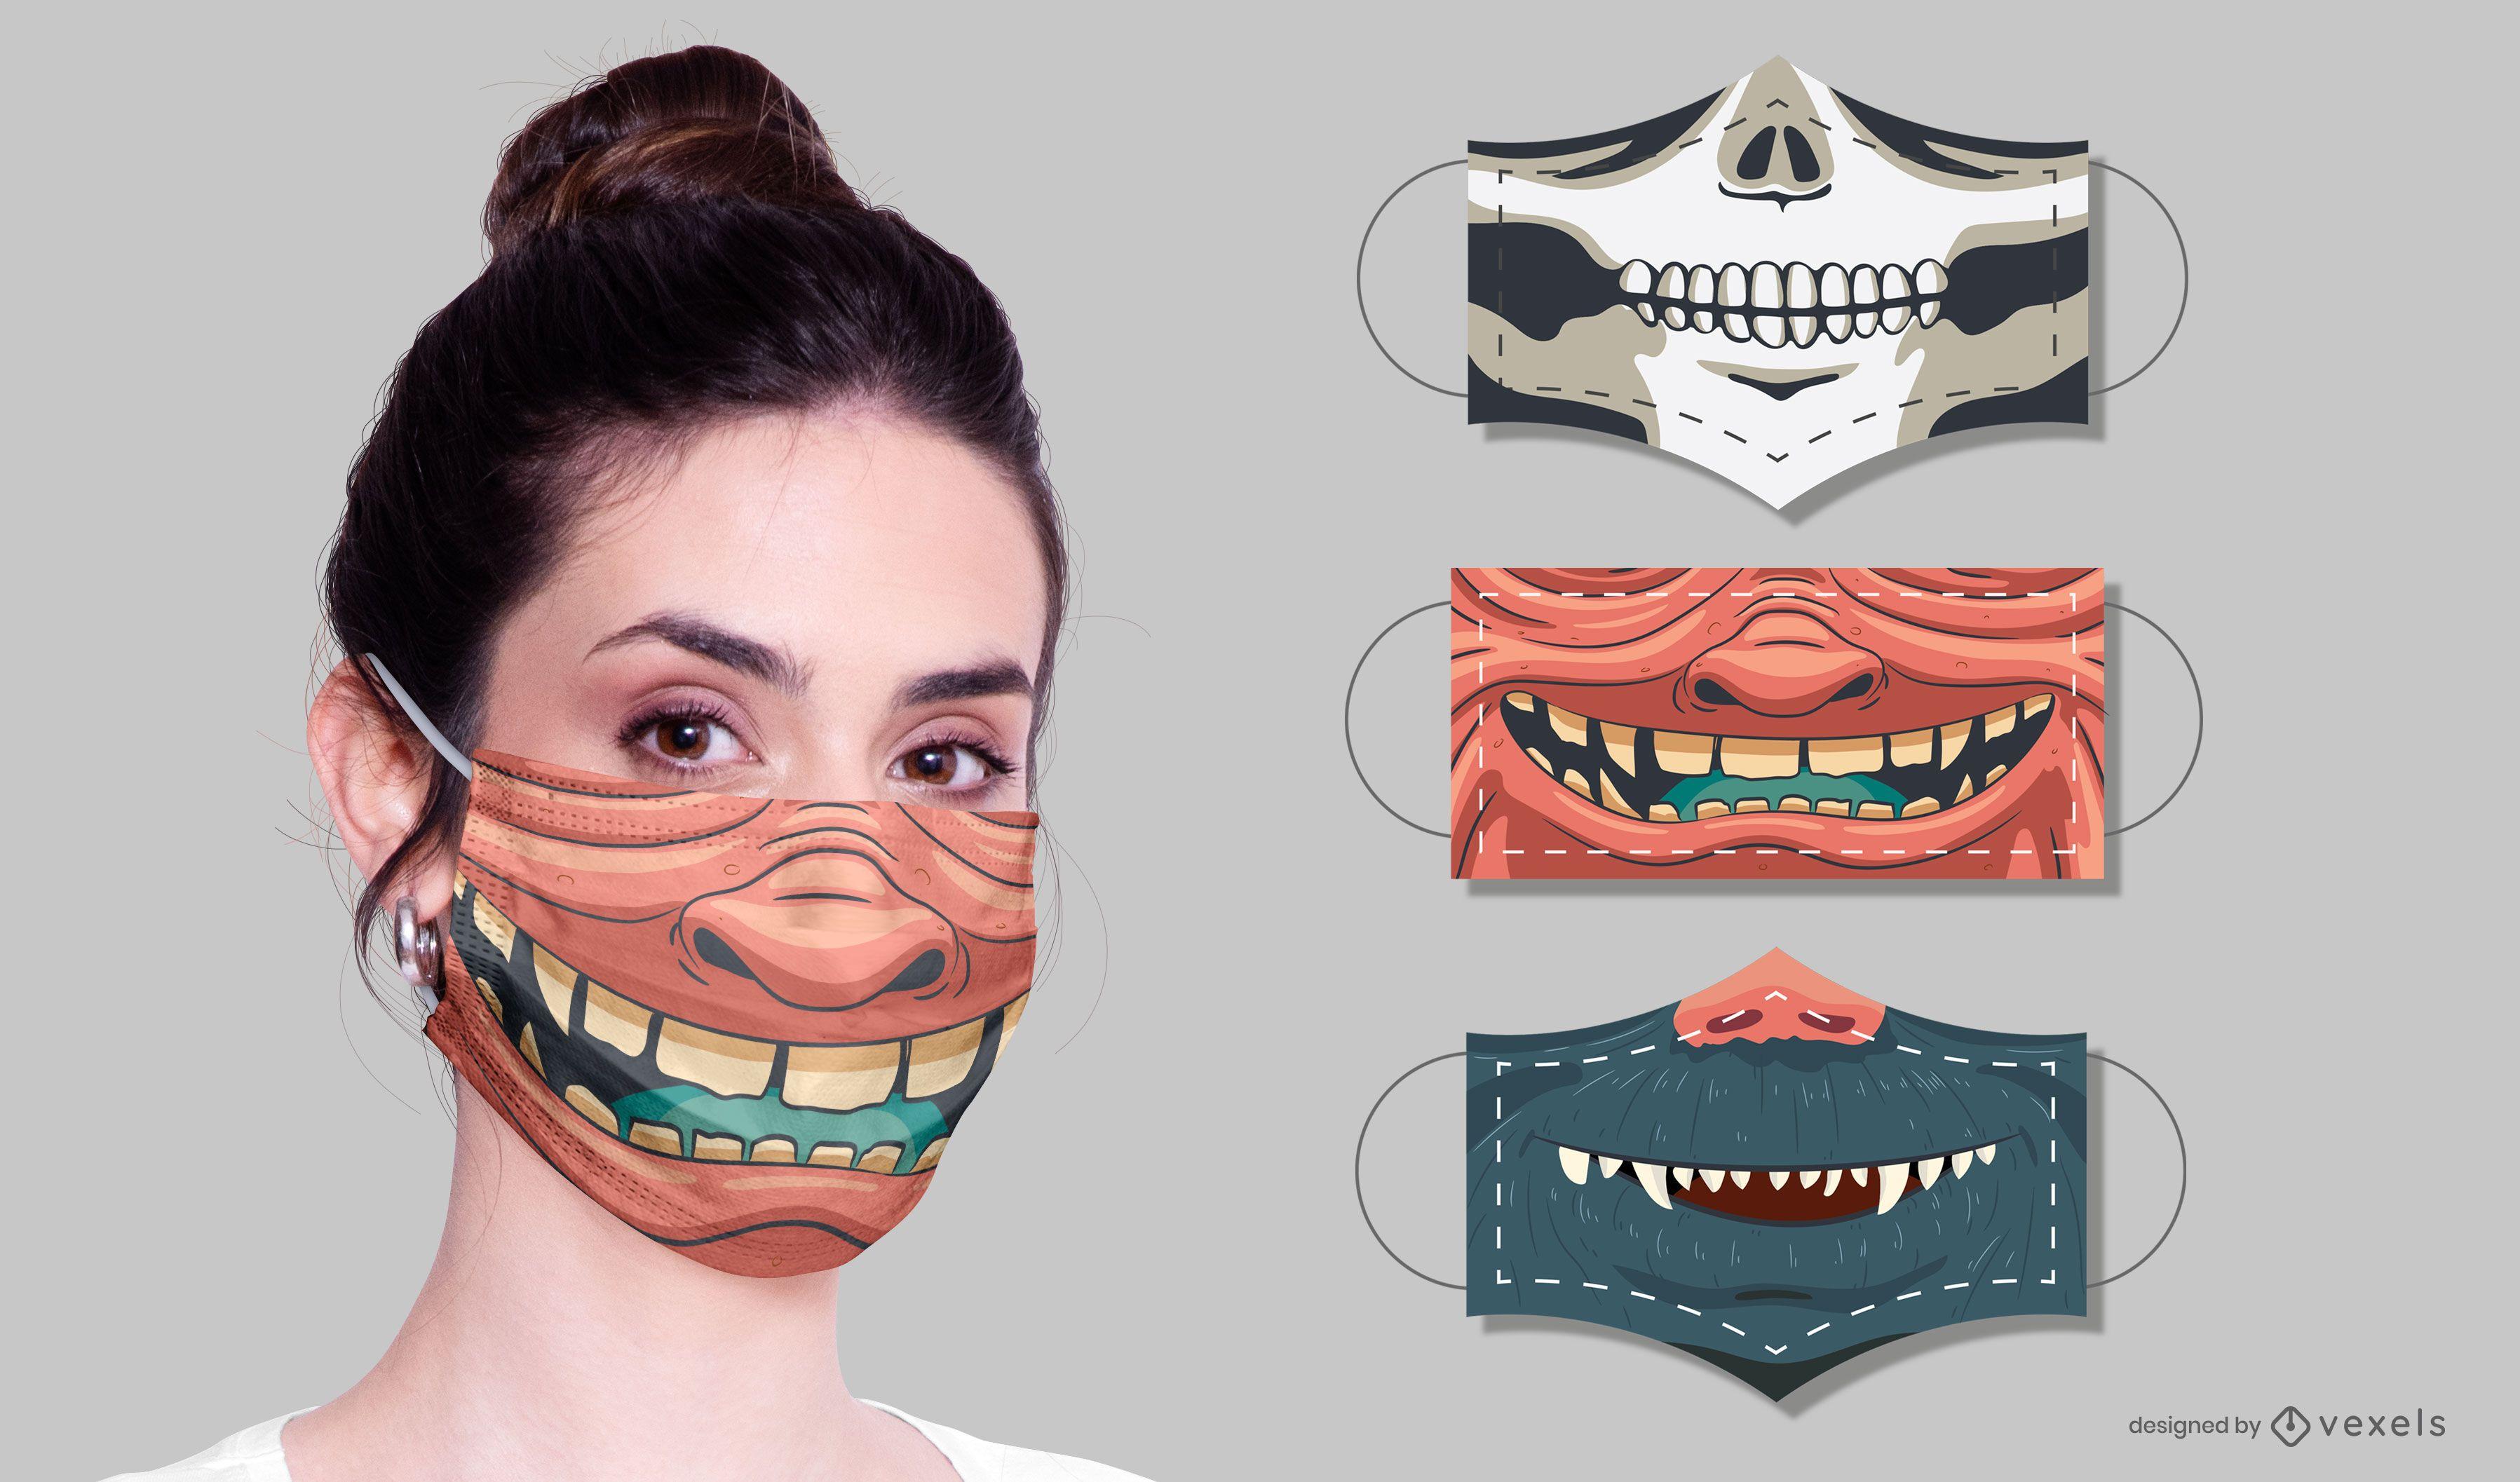 Conjunto de dise?o de m?scaras faciales de monstruo